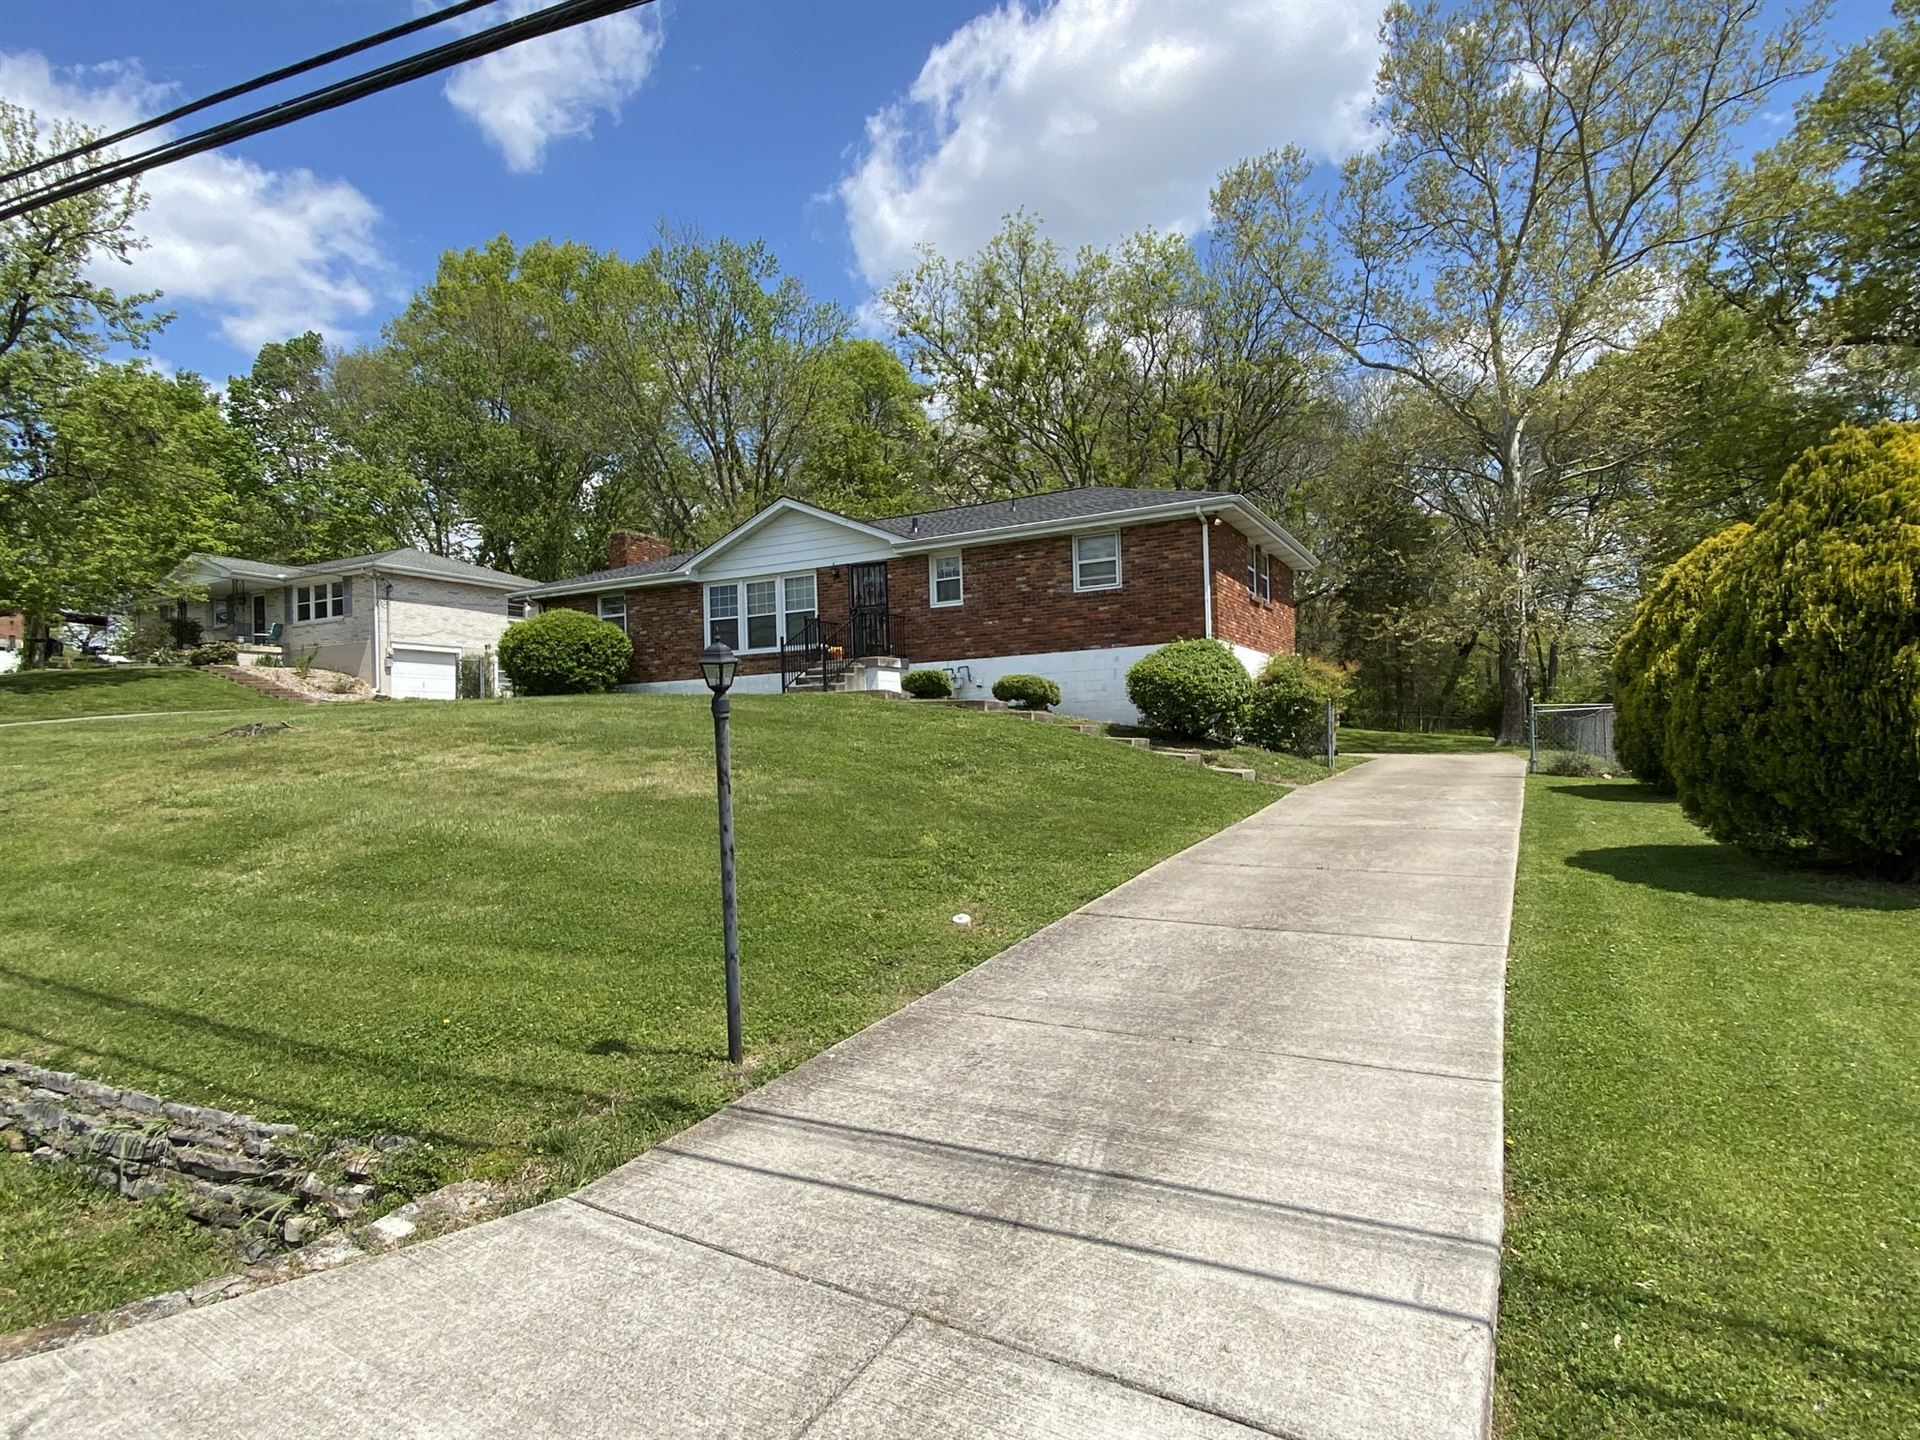 604 Glenpark Dr, Nashville, TN 37217 - MLS#: 2247226